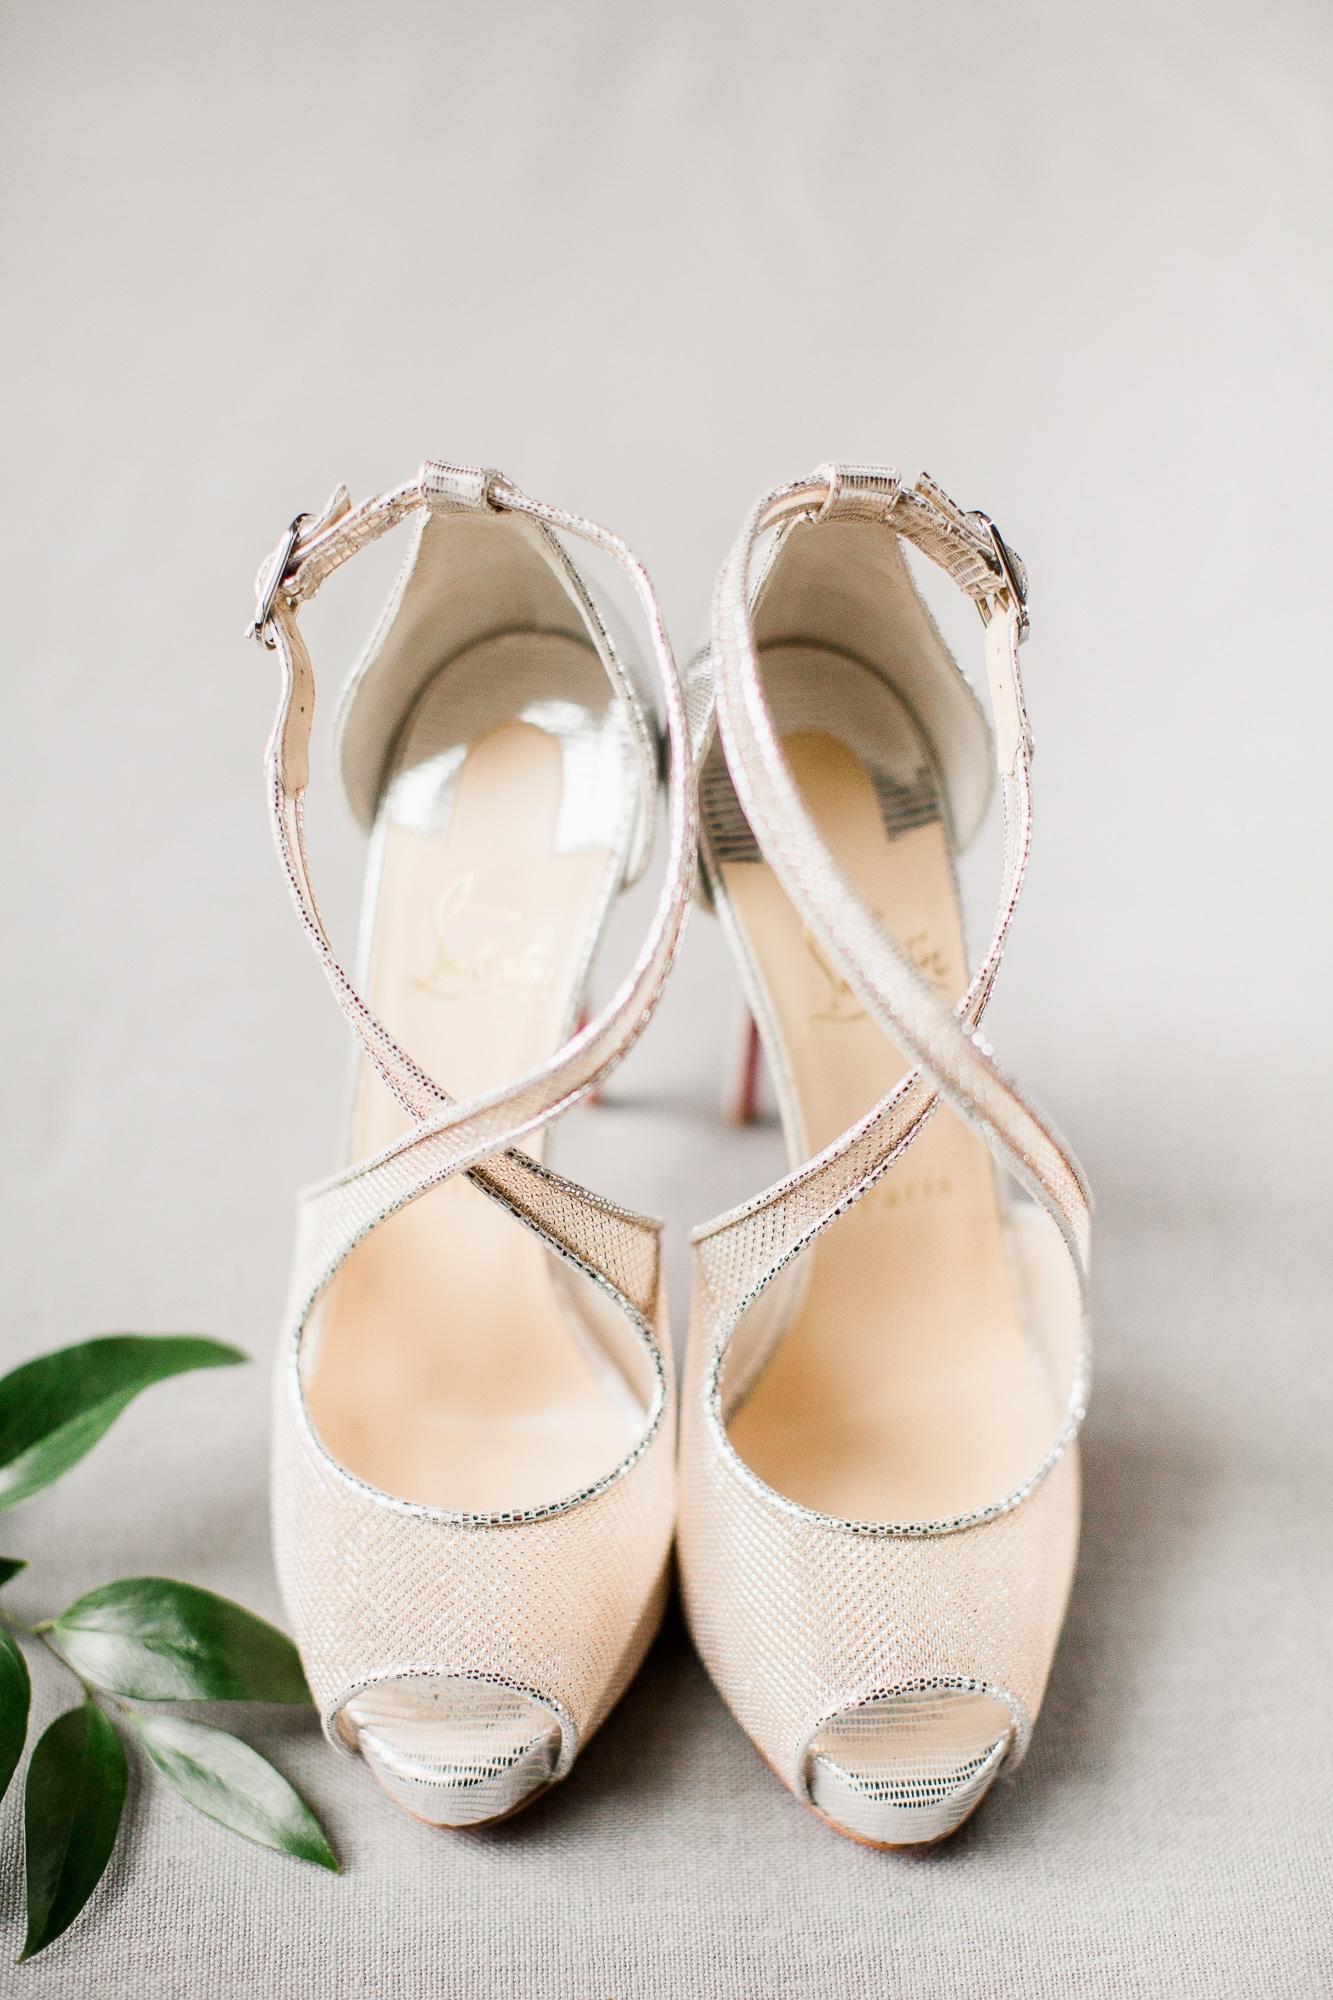 Christian Louboutin Bridal Shoes | Nashville Bride Guide